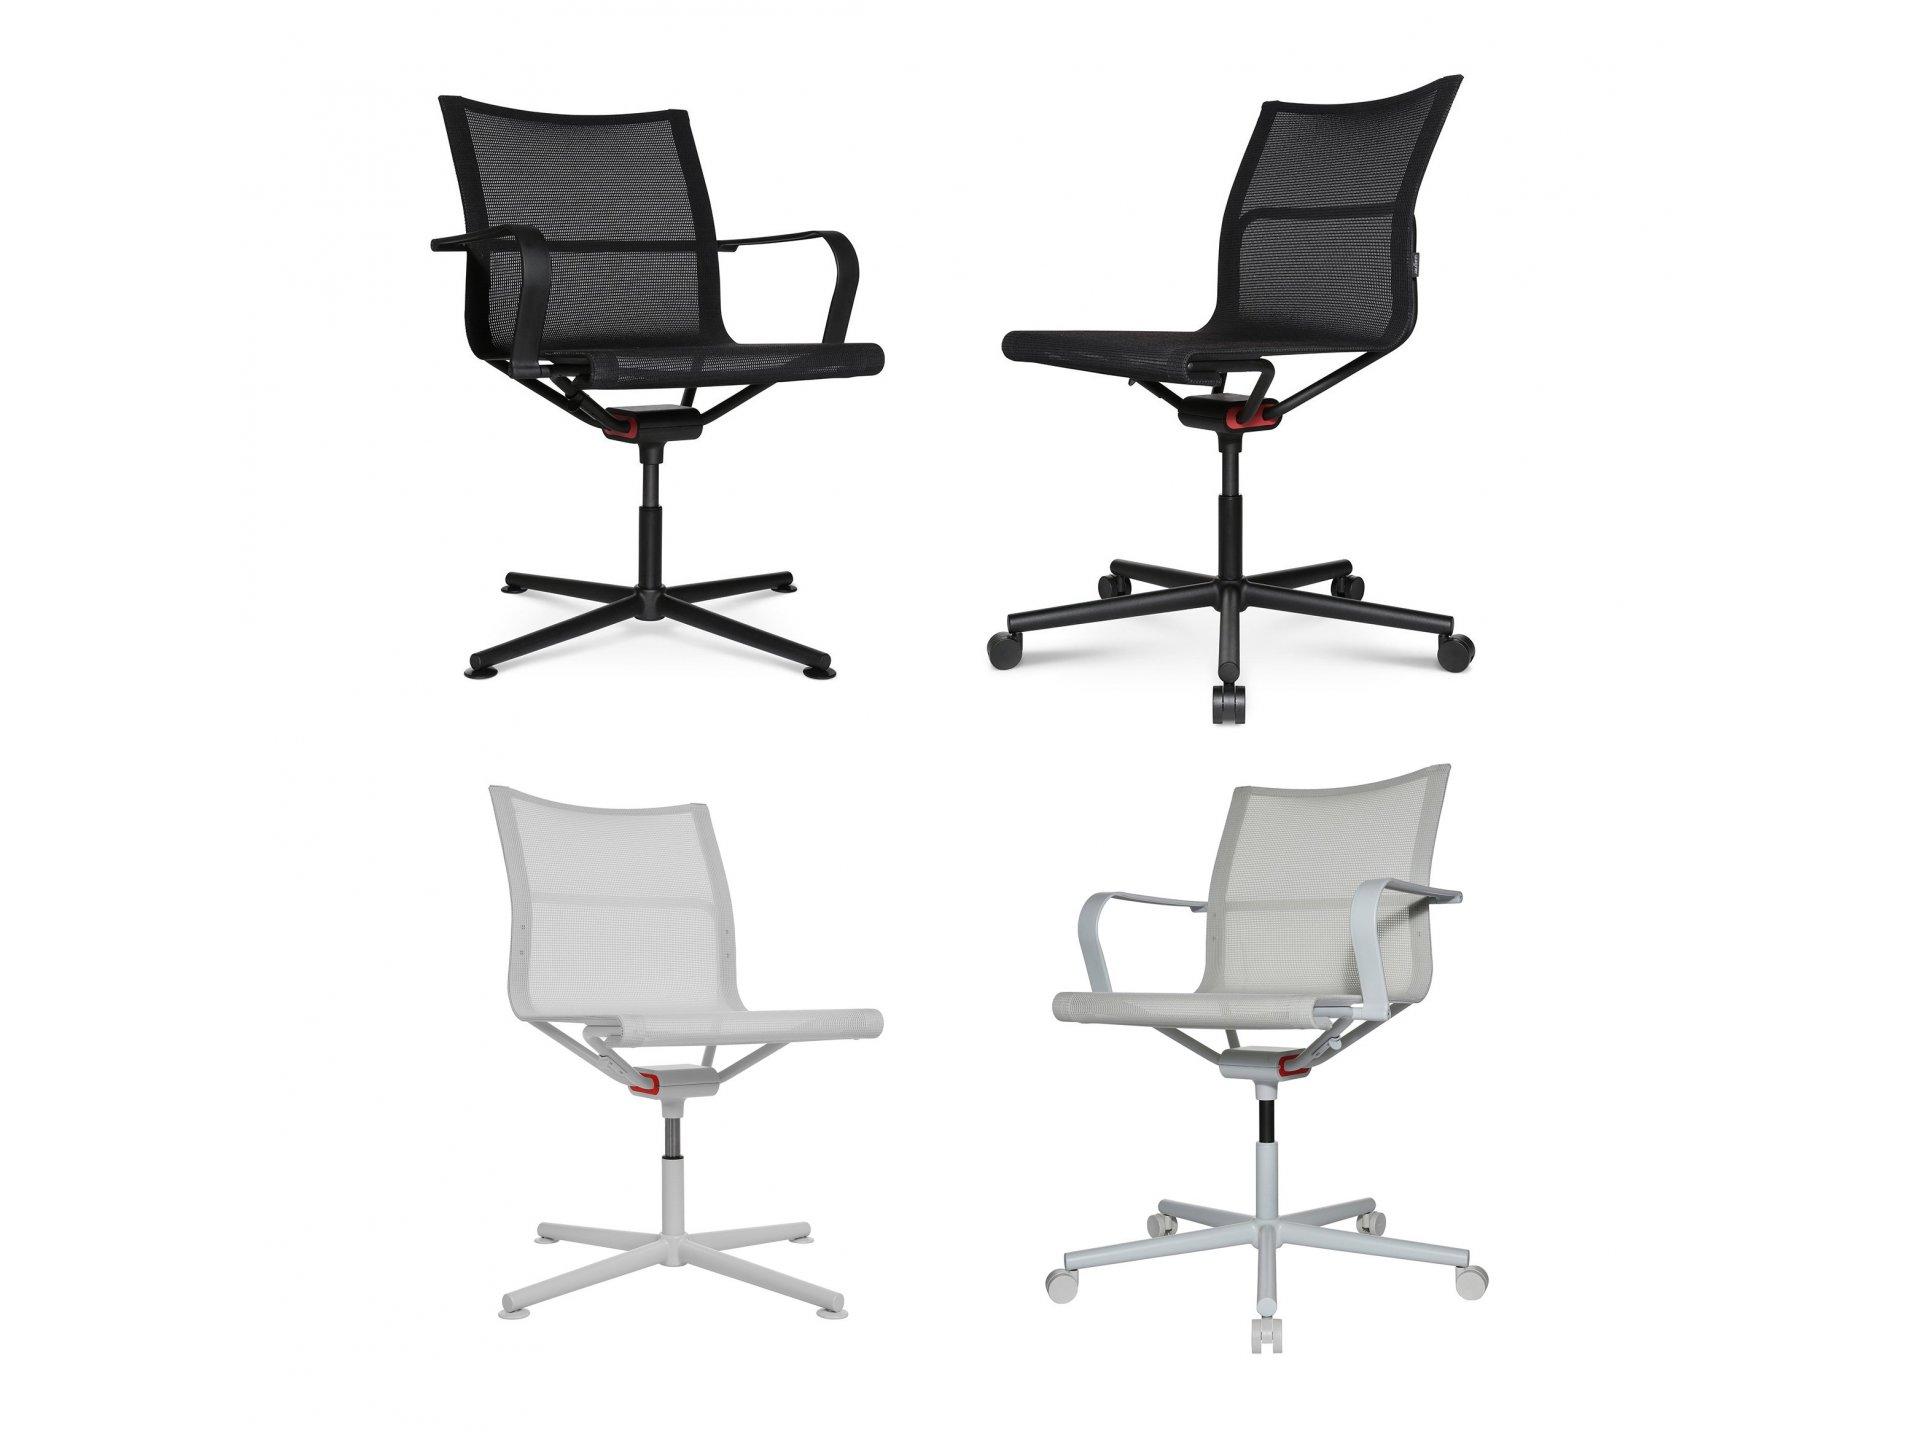 Shop Wagner D1 Swivel Chair Office Online At Modulor